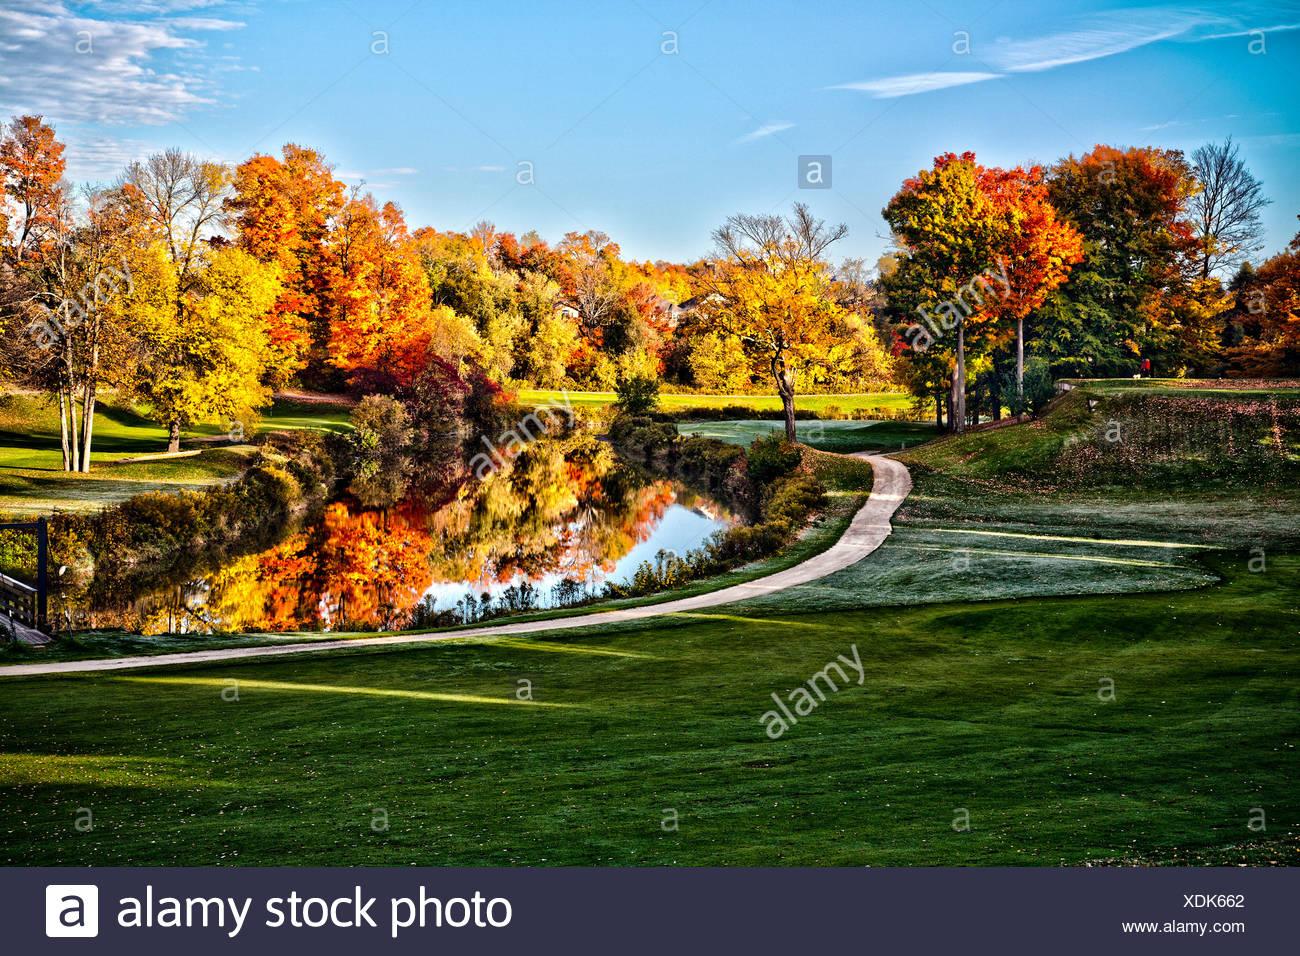 Autumn at The 9th hole of the Nattawasage Golf Course near Alliston, Ontario, Canada - Stock Image